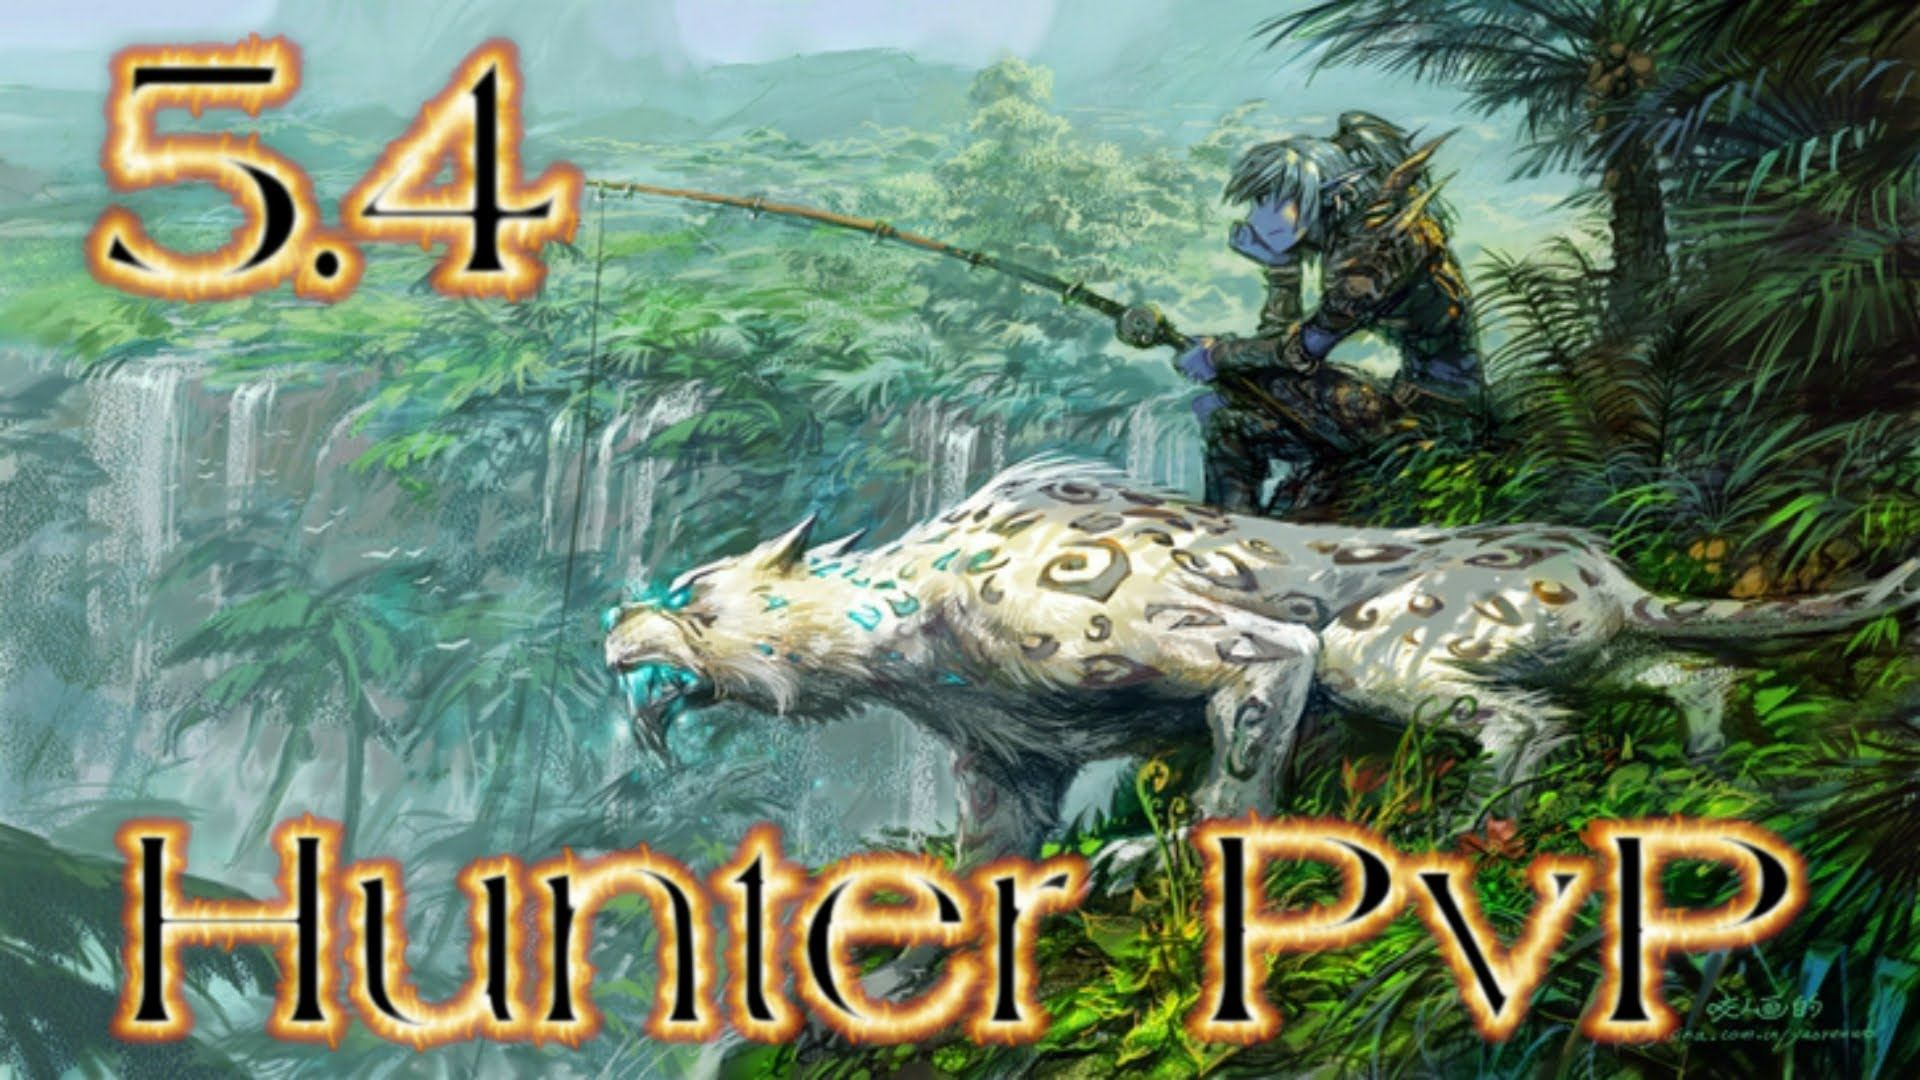 5 4 Bm Hunter Pvp 1080p Hunter Monk 2s With Xuen World Of Warcraft Wallpaper Warcraft Art World Of Warcraft